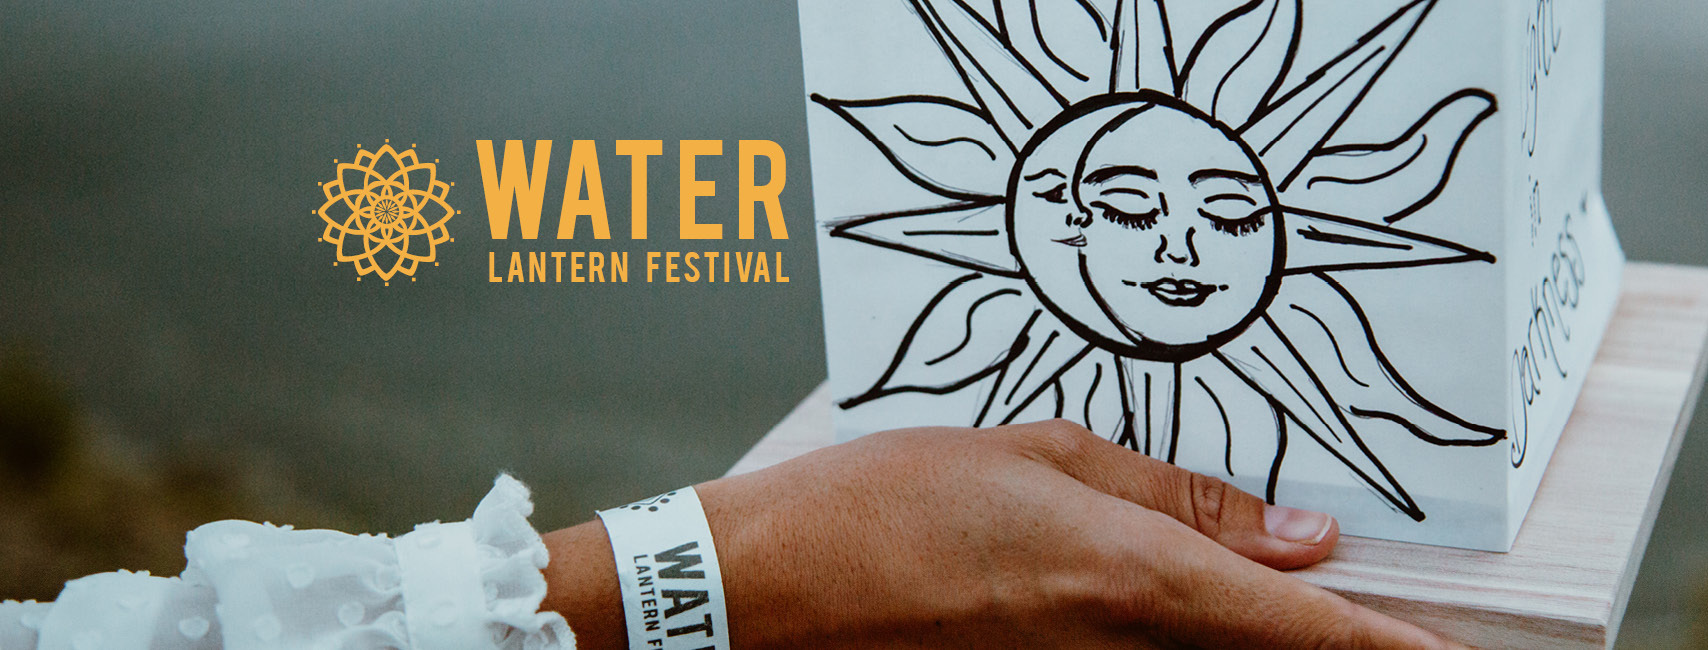 Indianapolis Water Lantern Festival